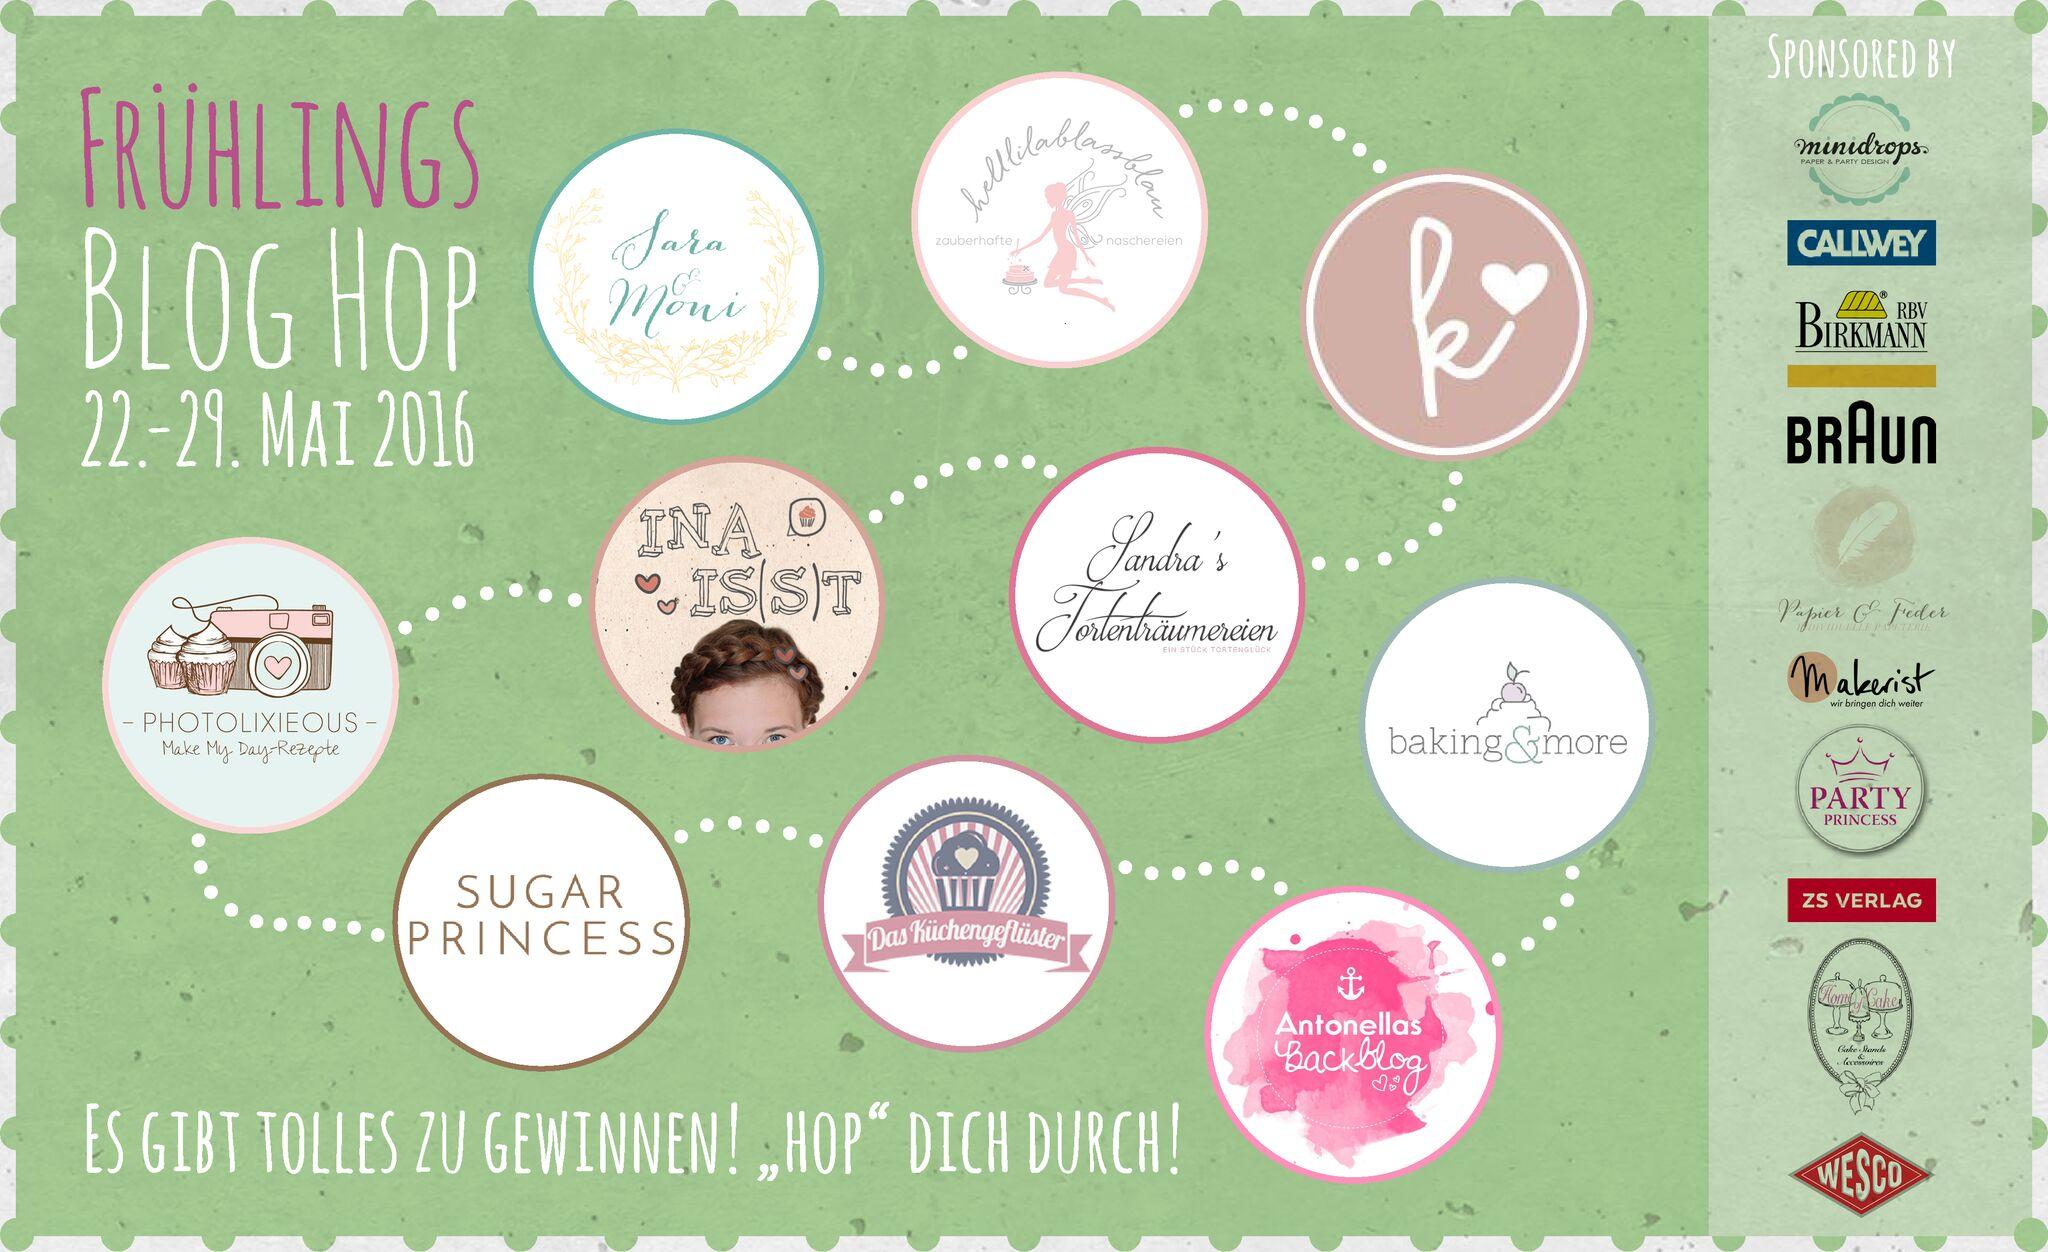 Banner Frühlings Blog Hop mit den Teilnehmerlogos